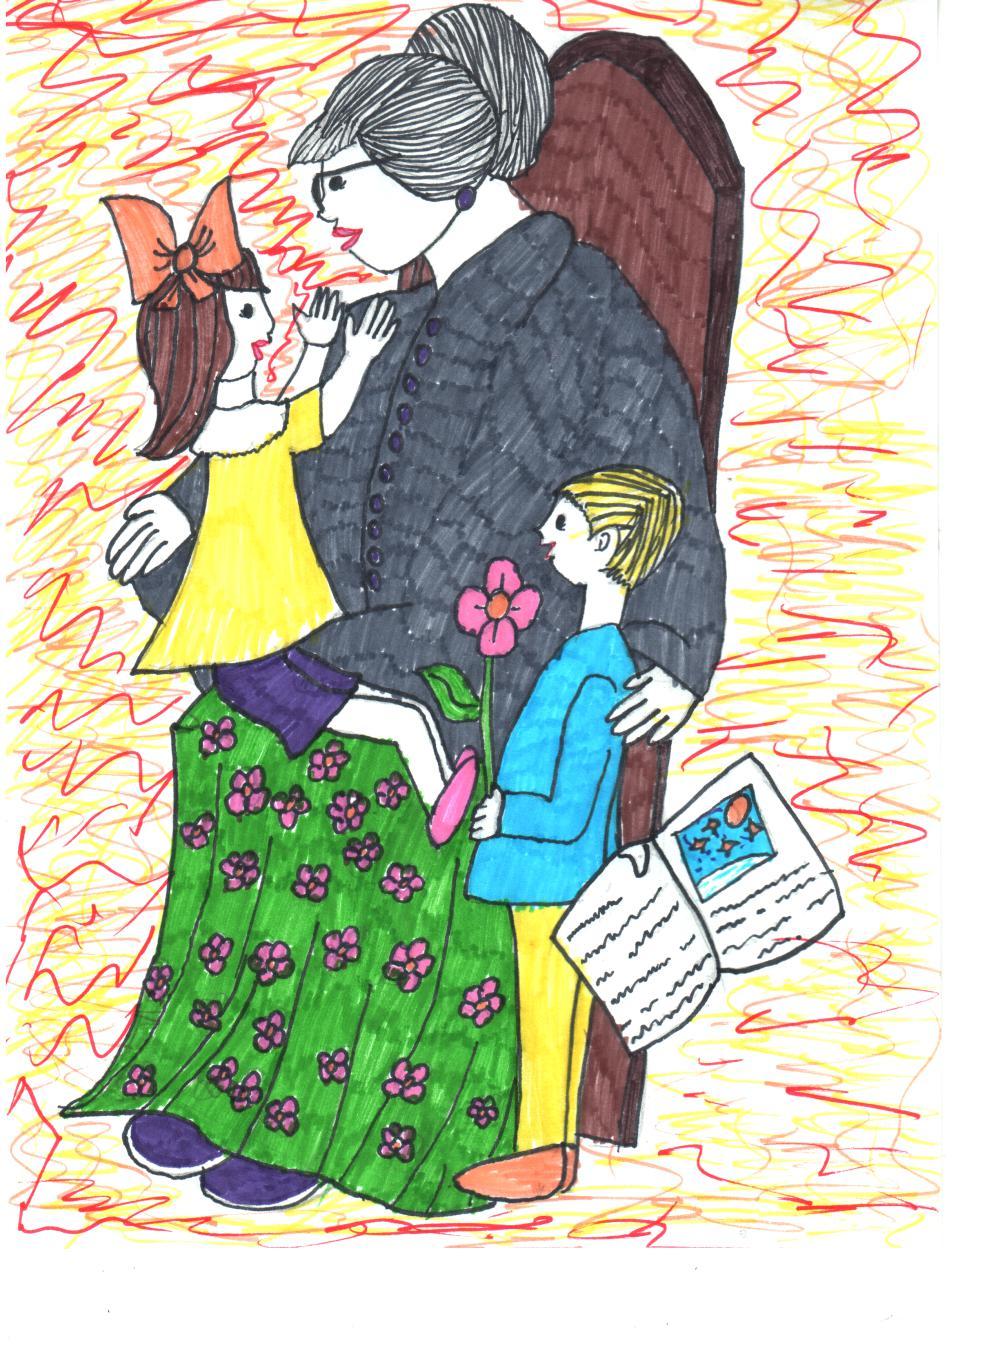 E:\БАБУШКА\Новая папка (3)\бабушкины сказки 10-11\fg0003.tif